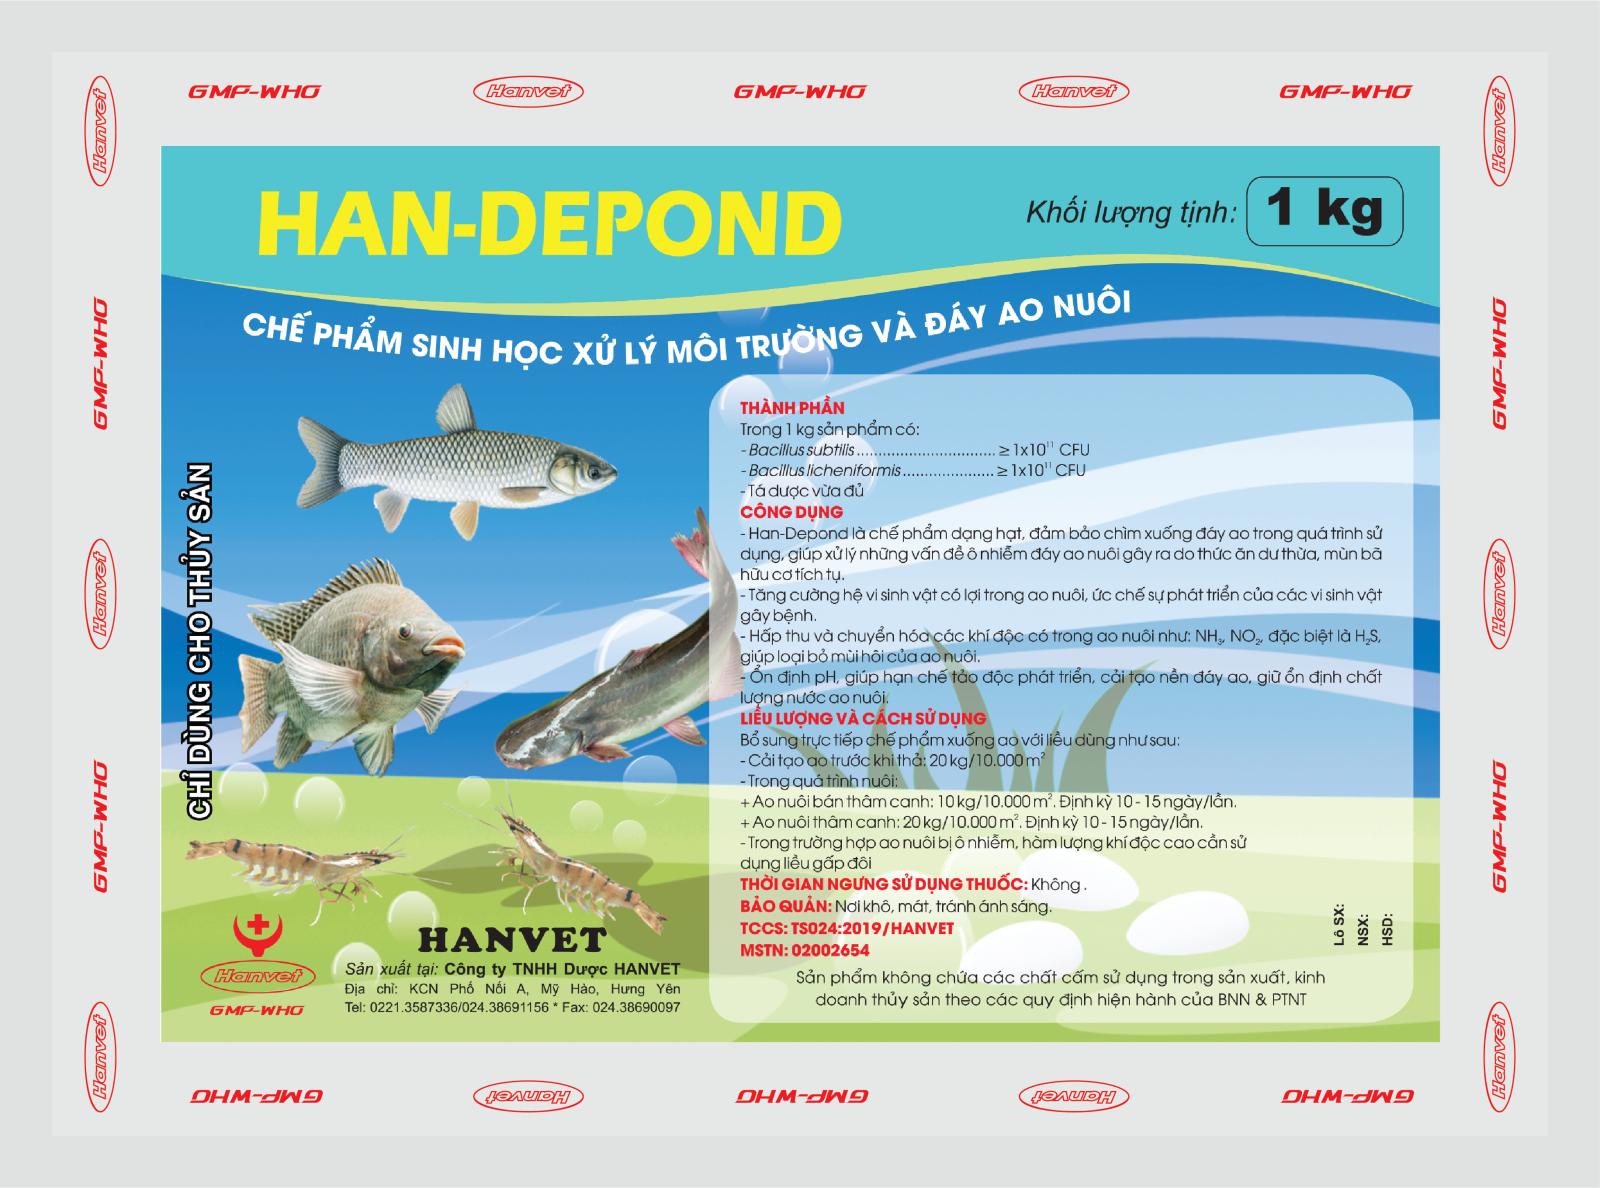 HAN-DEPOND